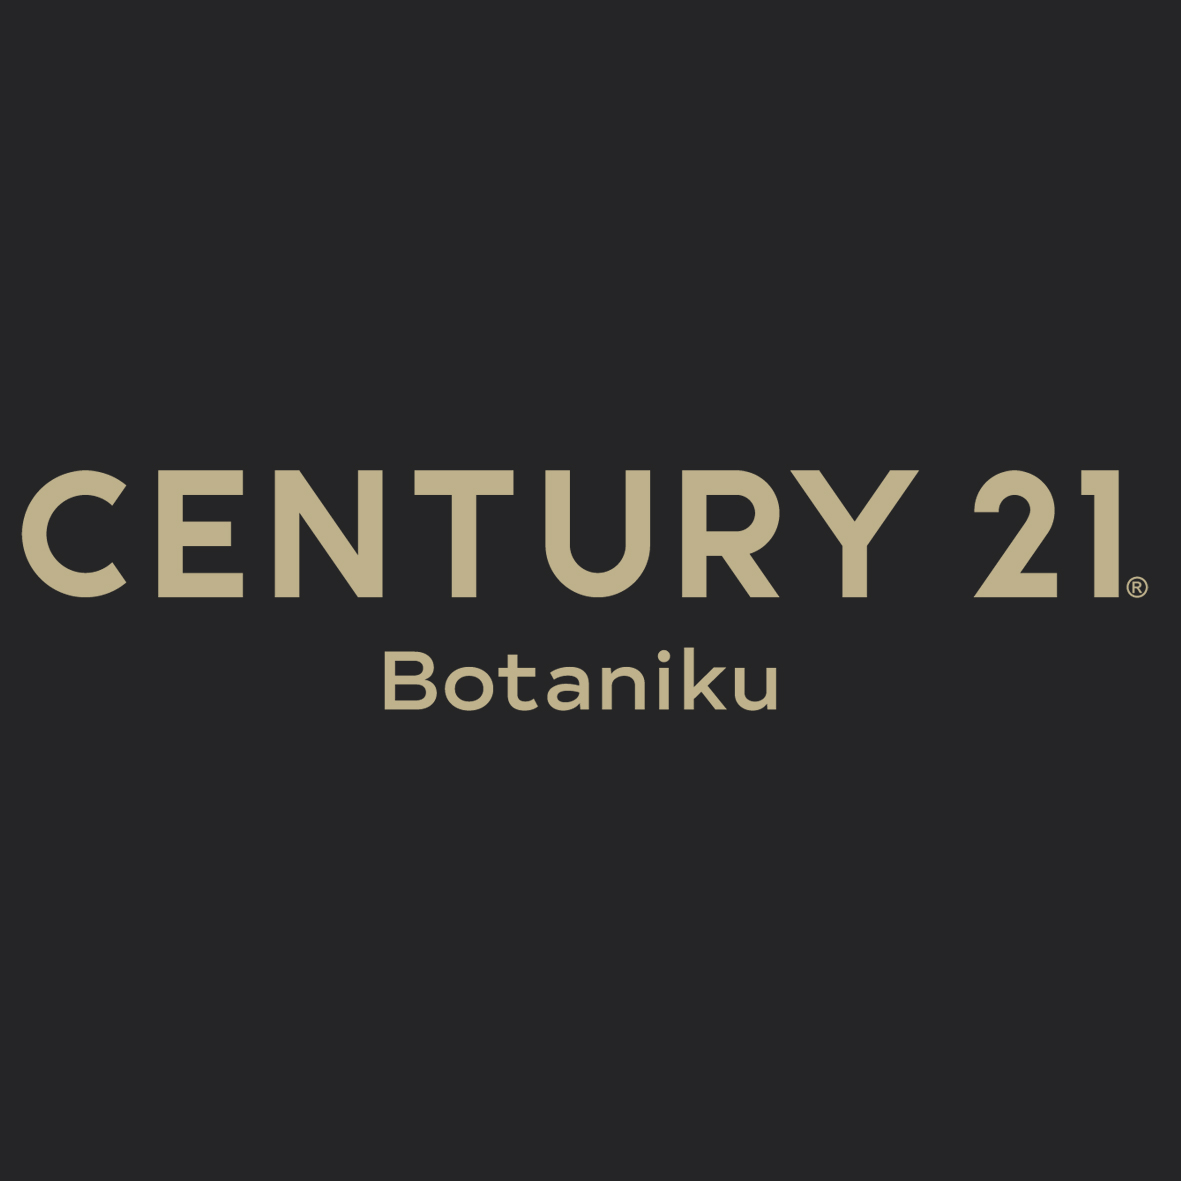 CENTURY 21 Botaniku